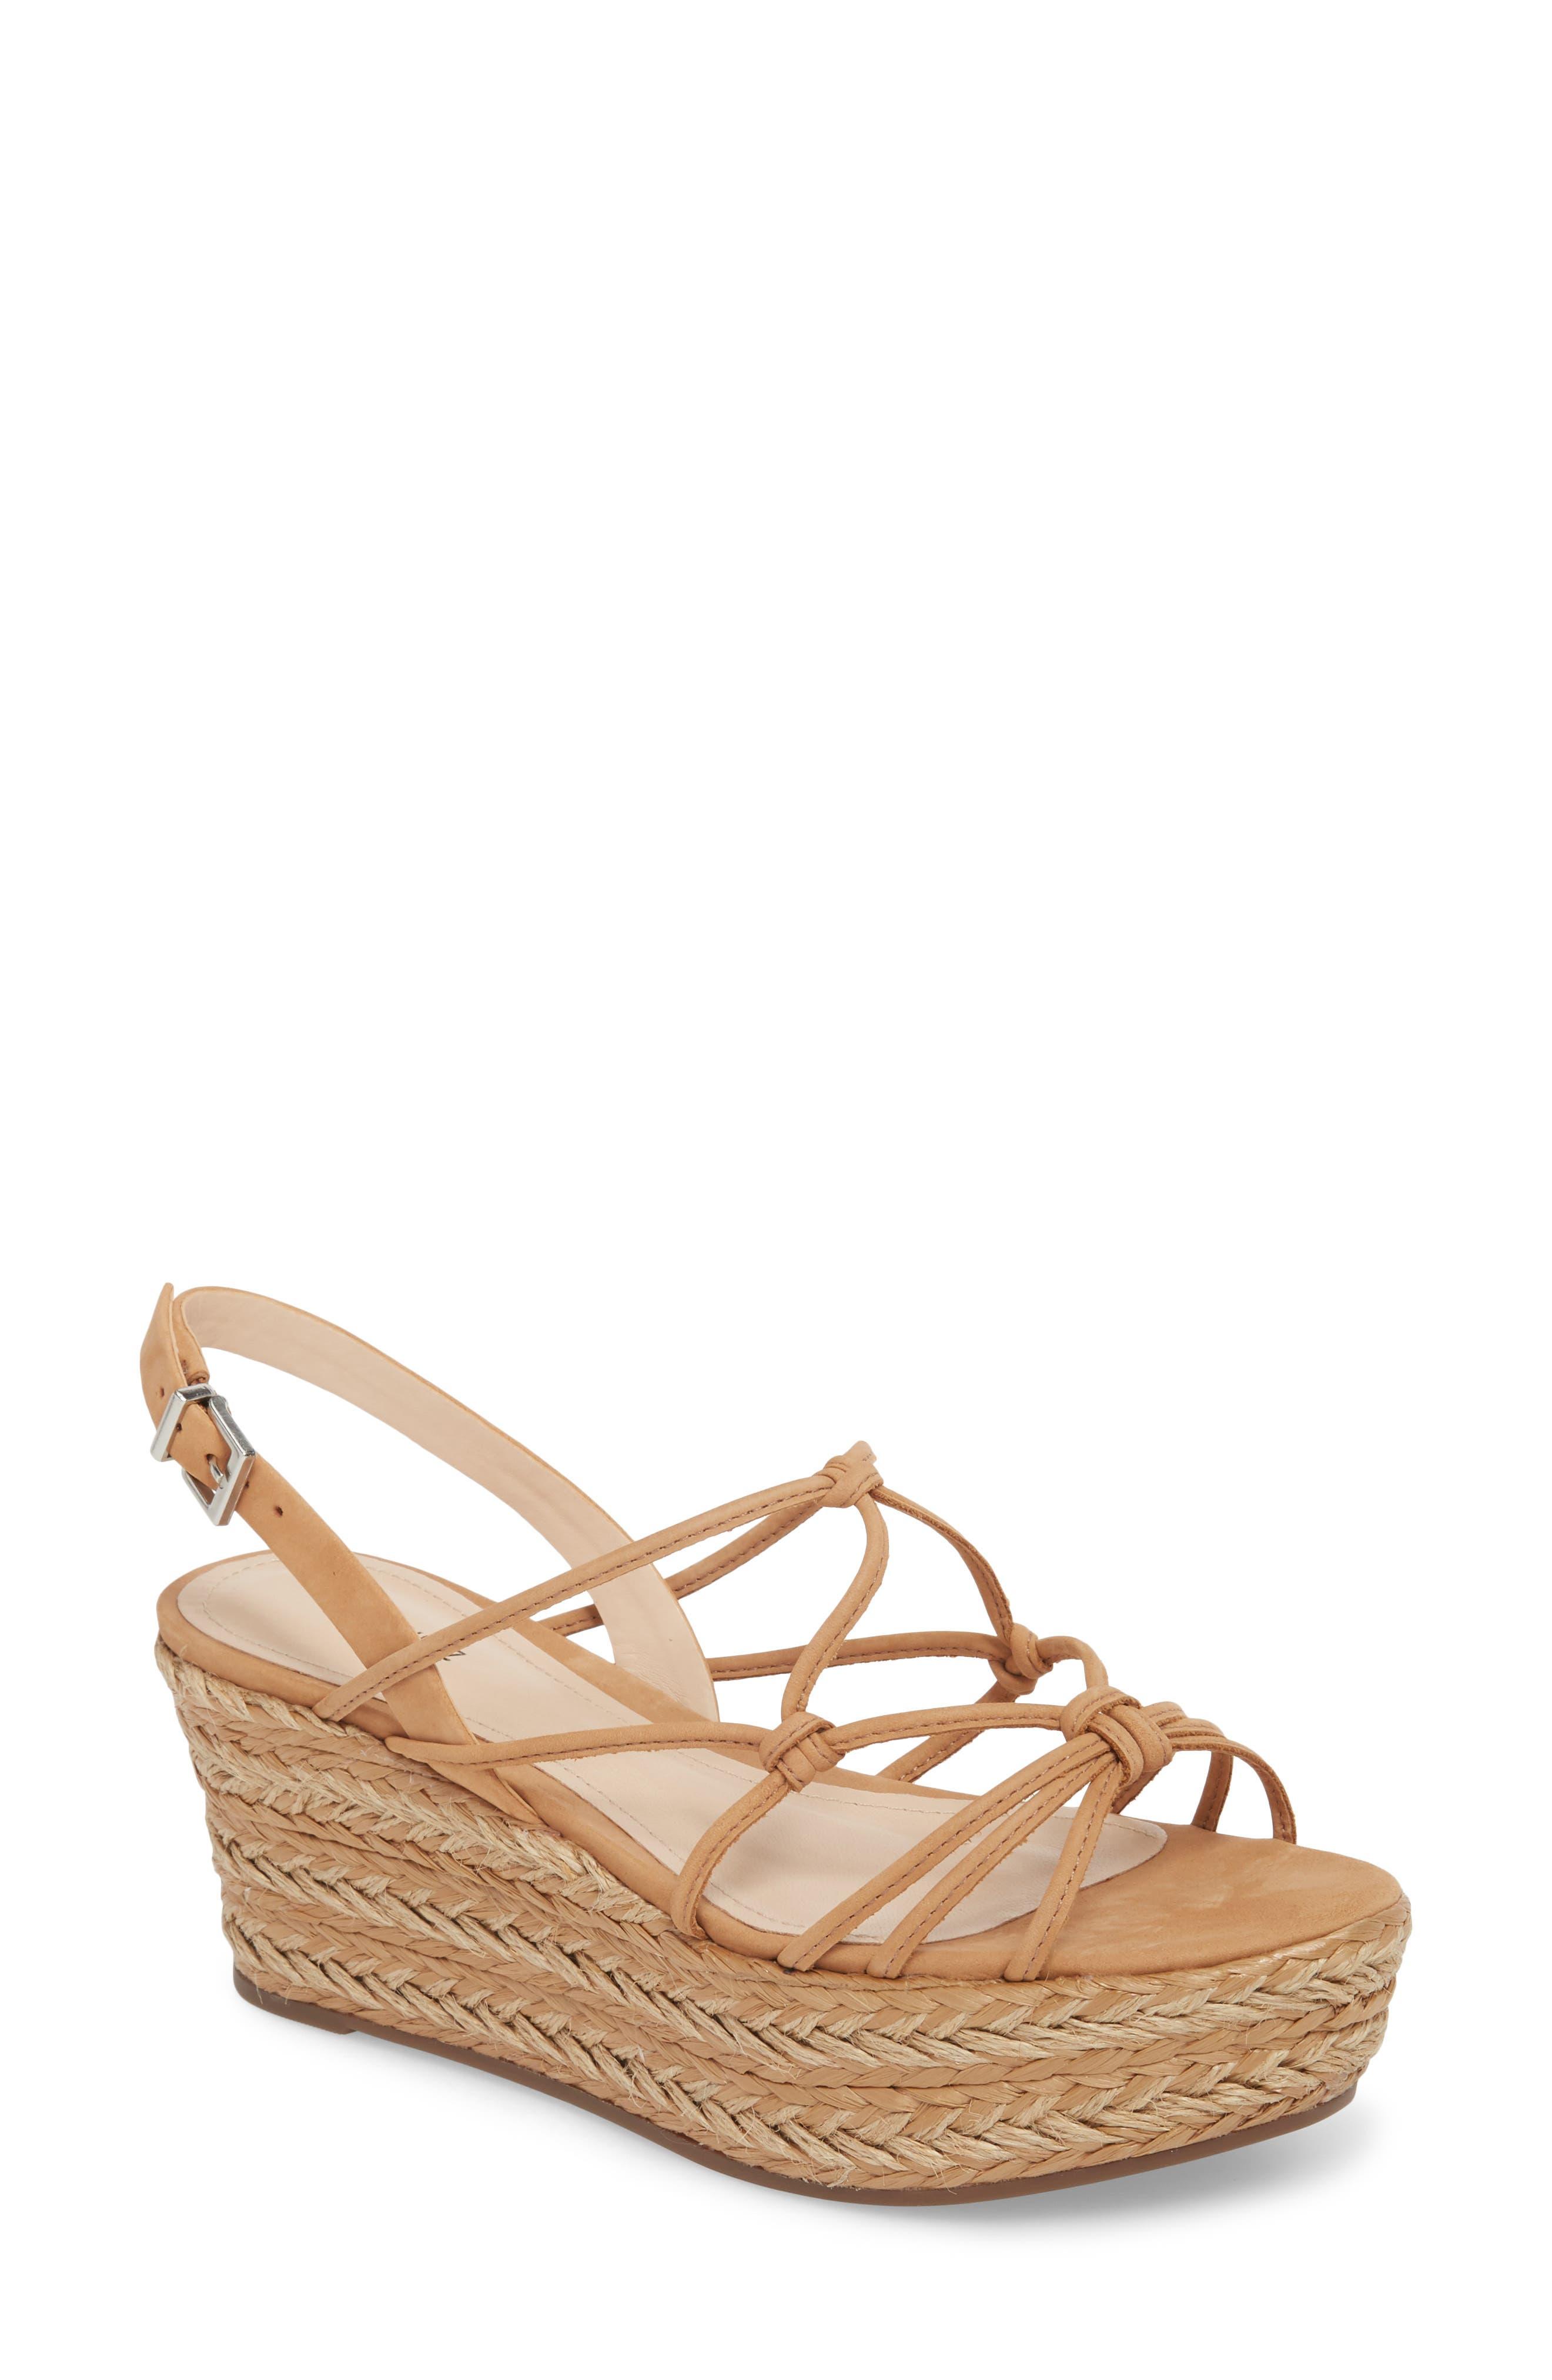 Latussa Platform Espadrille Sandal,                         Main,                         color, Desert Leather